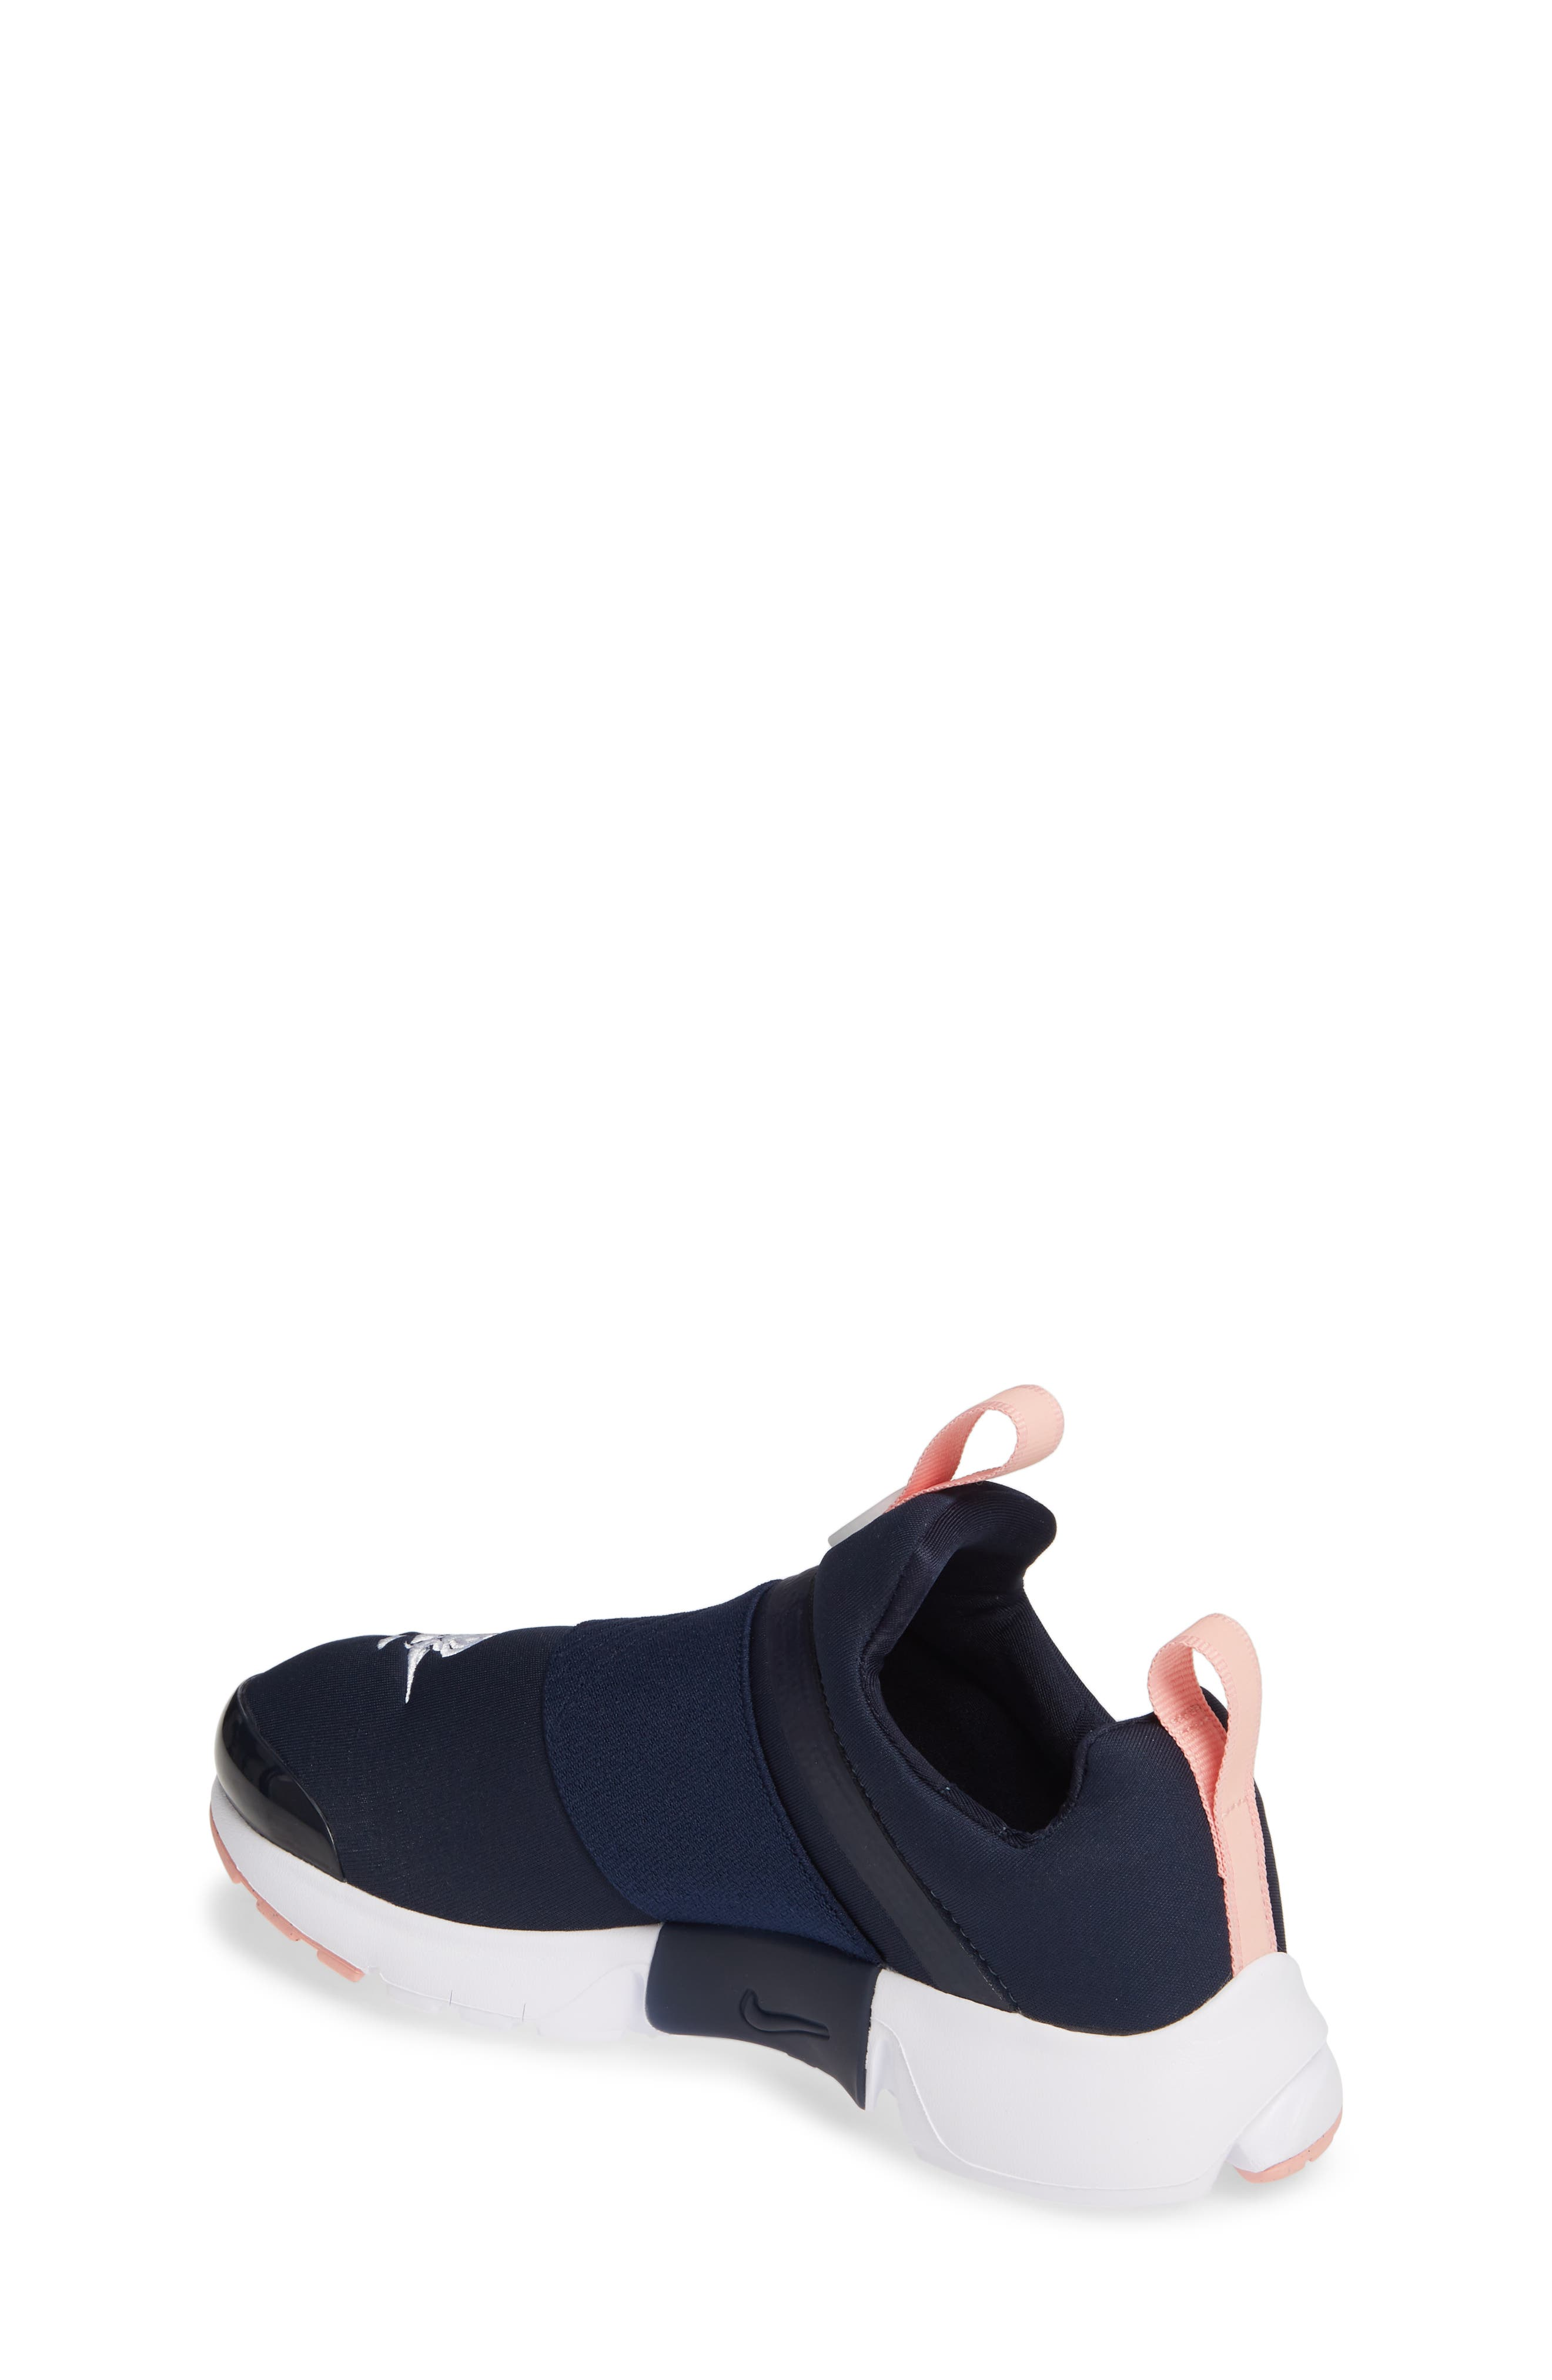 NIKE,                             Presto Extreme VDAY Sneaker,                             Alternate thumbnail 2, color,                             OBSIDIAN/ BLEACHED CORAL-WHITE